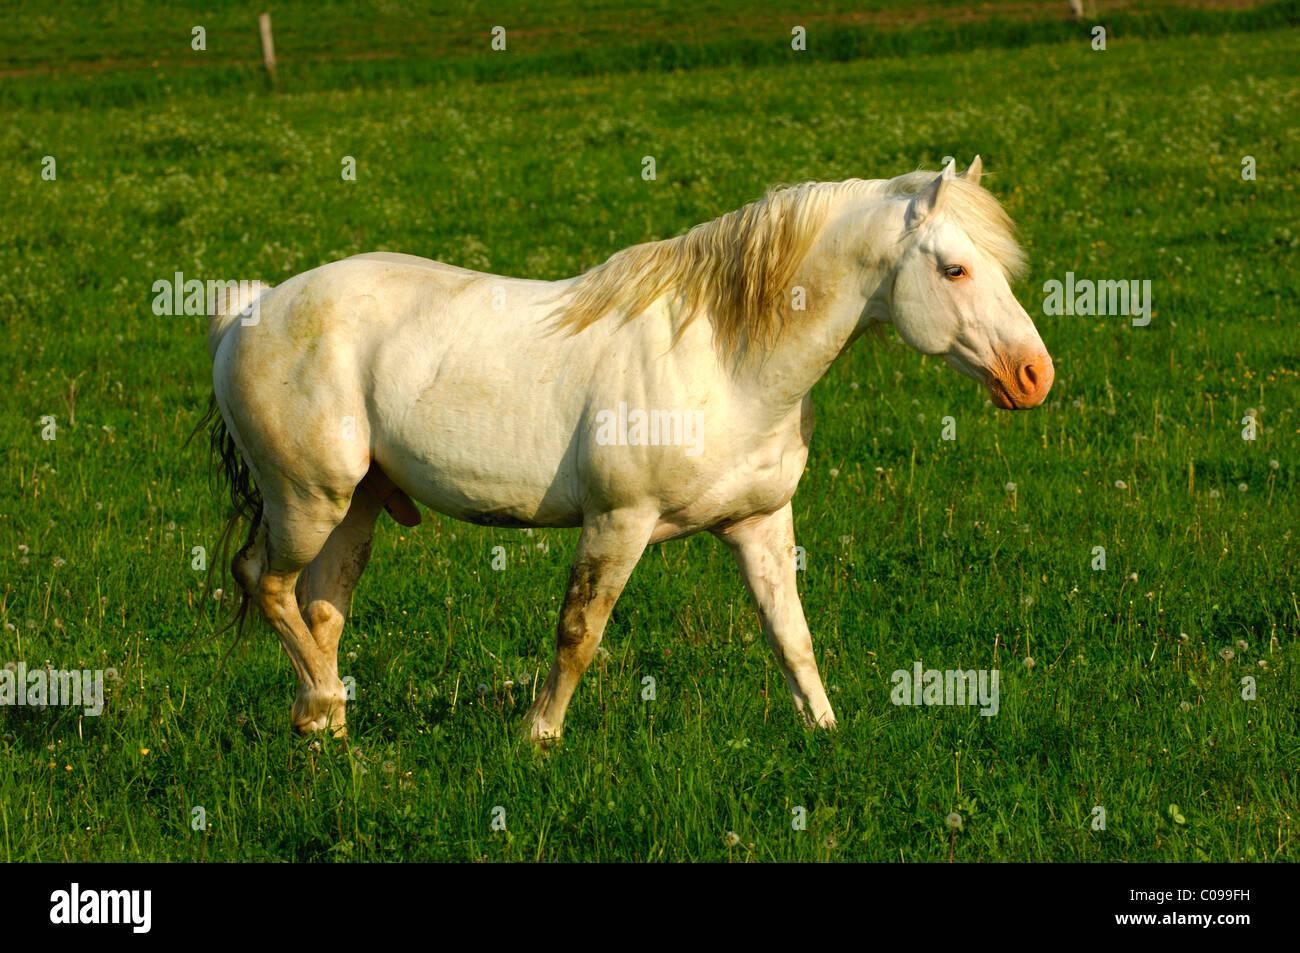 Hanoverian stallion, white stallion in a paddock - Stock Image